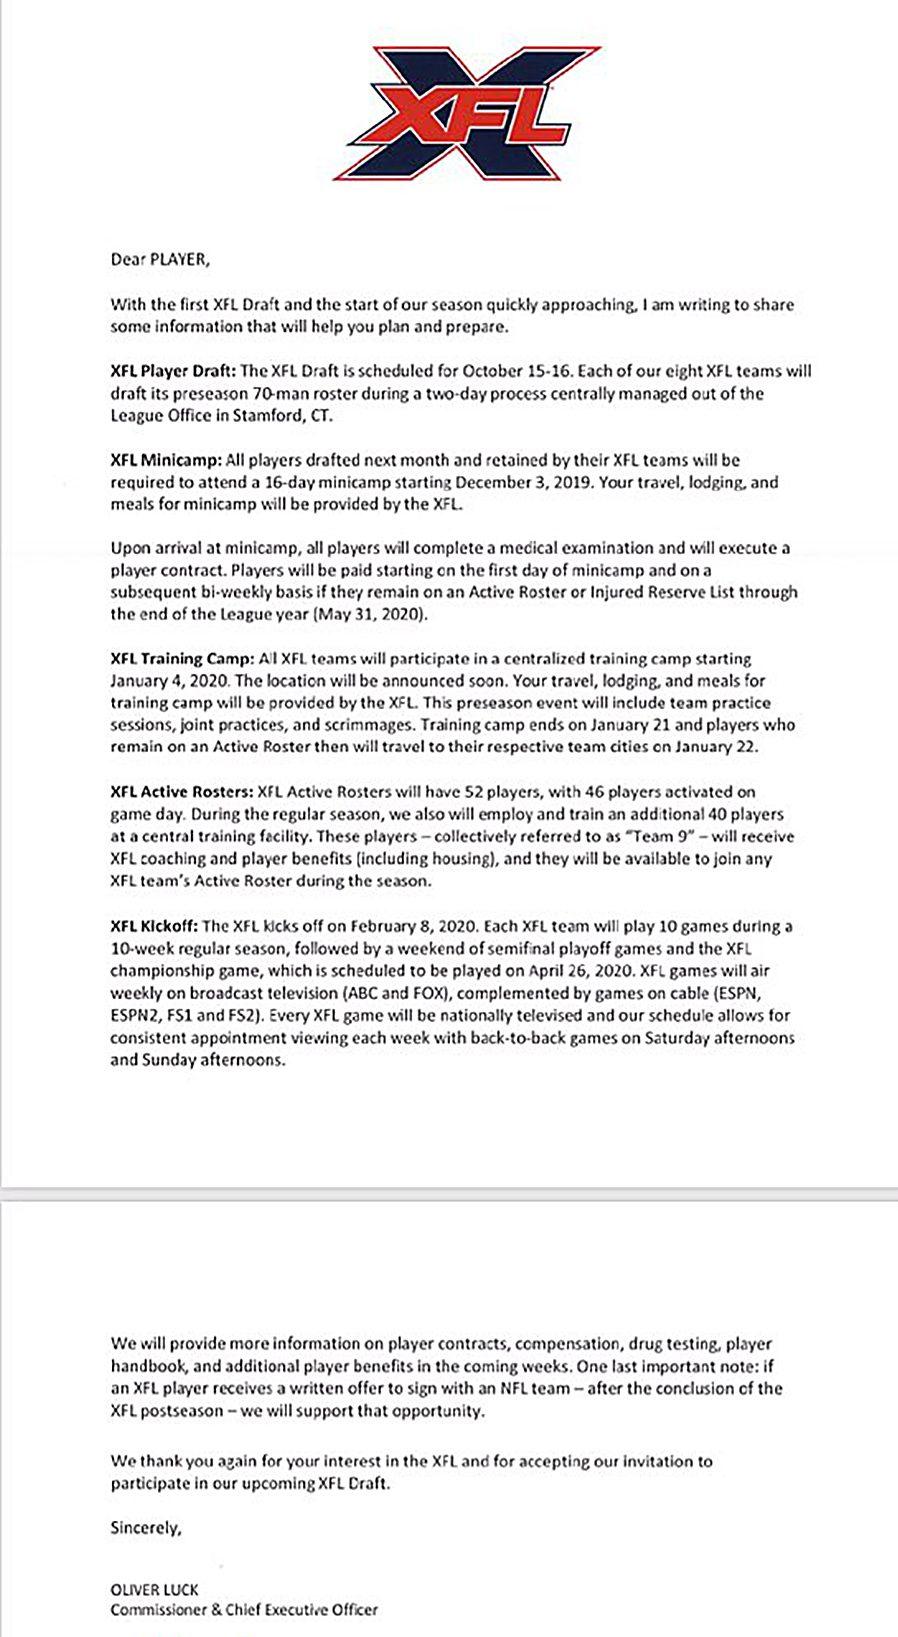 XFL Draft Information